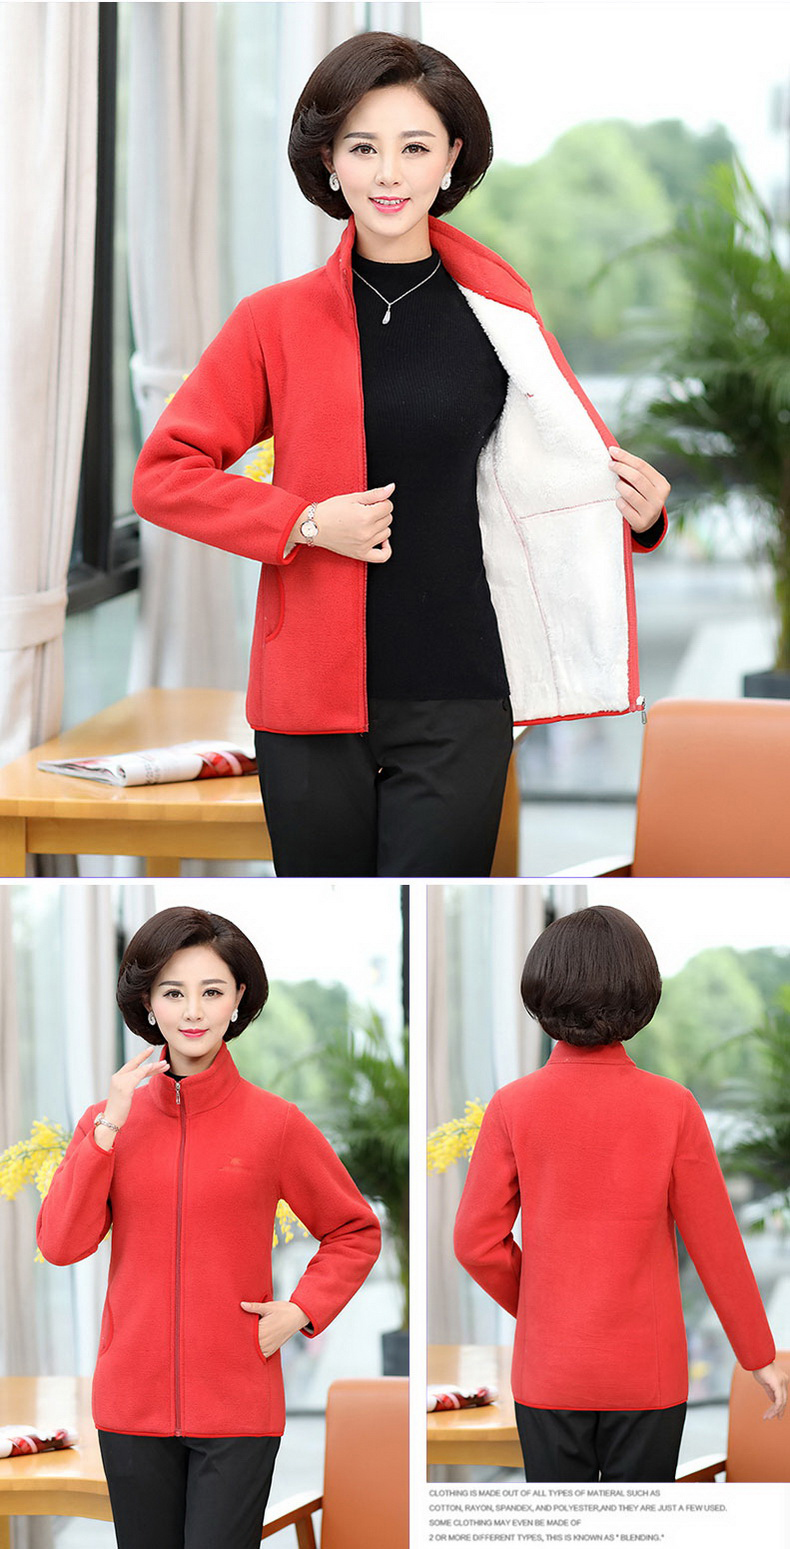 Women Fleece Coat Stand Collar Outerwear Autumn Winter Woman Imitation Lambs Polar Fleece Jacket Warm Lightweight Coat Woman (7)